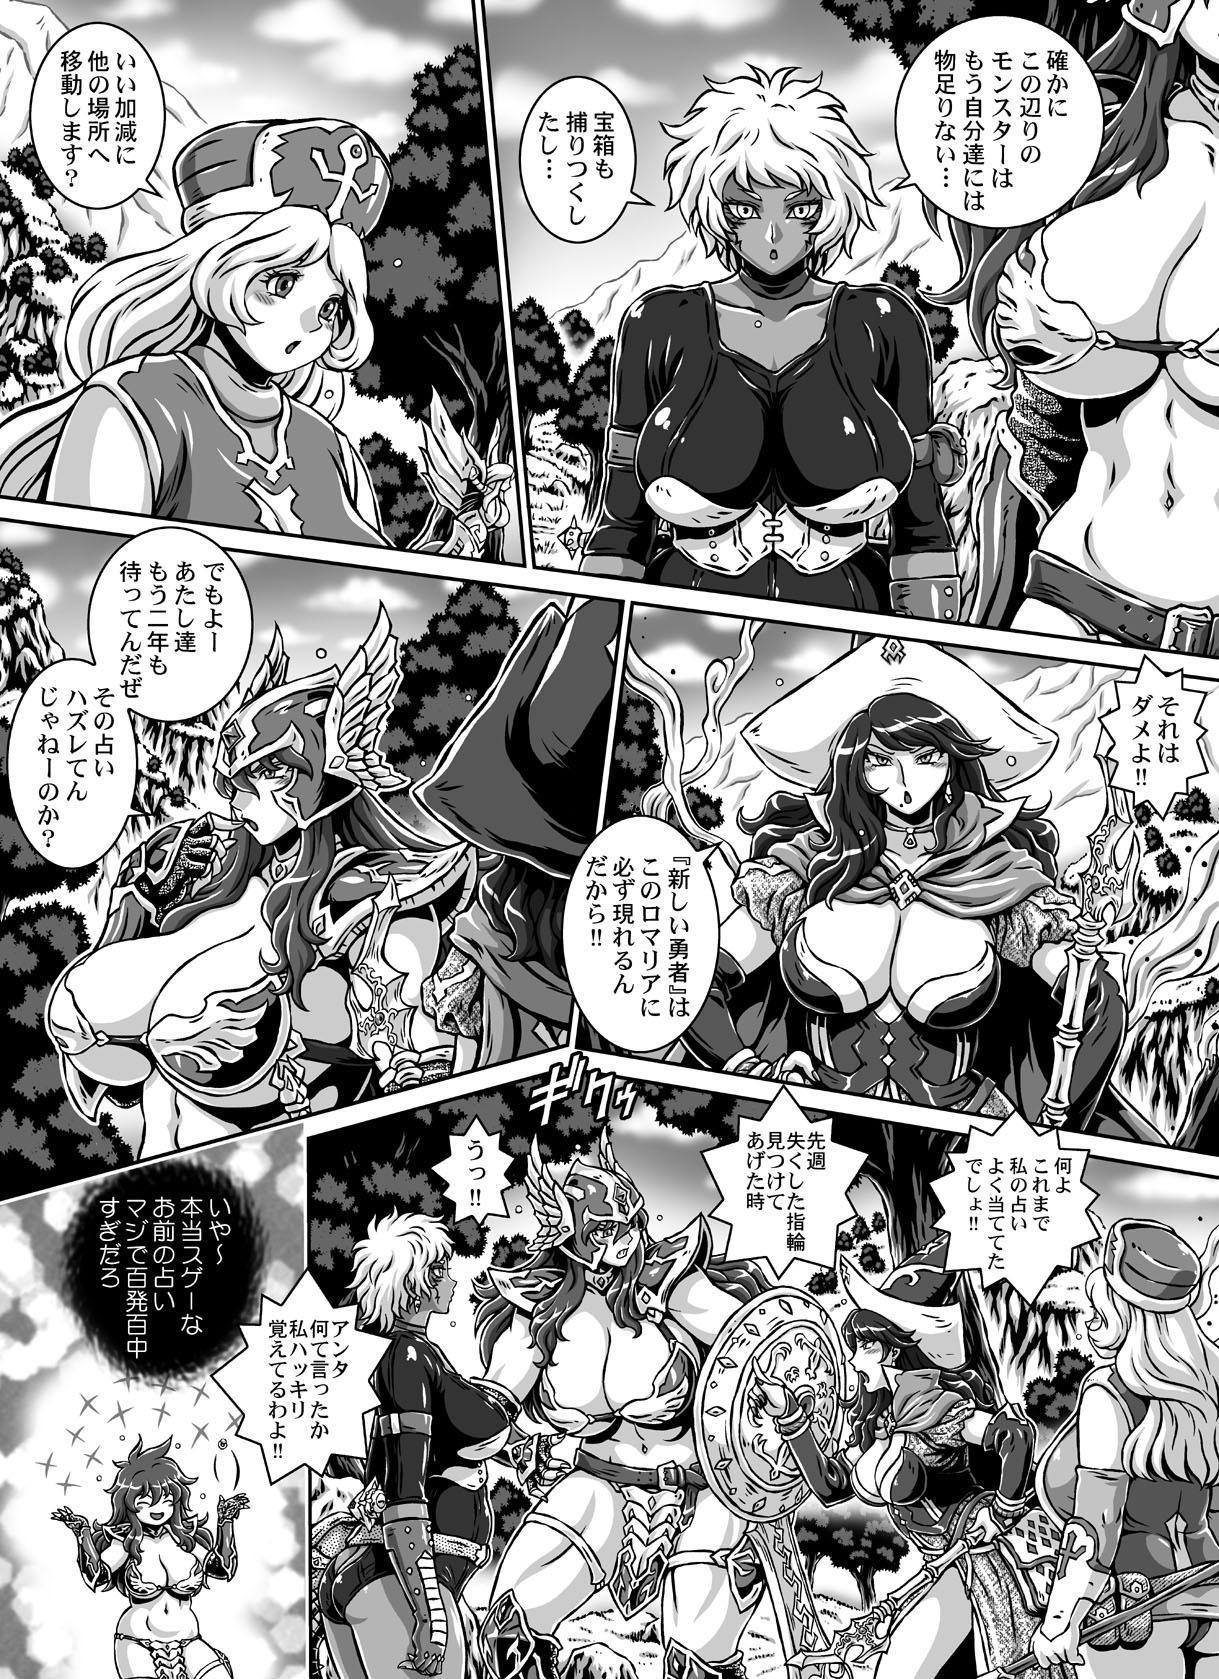 [Naginata-kan (Matsurino Naginata)] D-Q-R ~PROOF OF THE HERO~ (Dragon Quest III) [Digital] 9